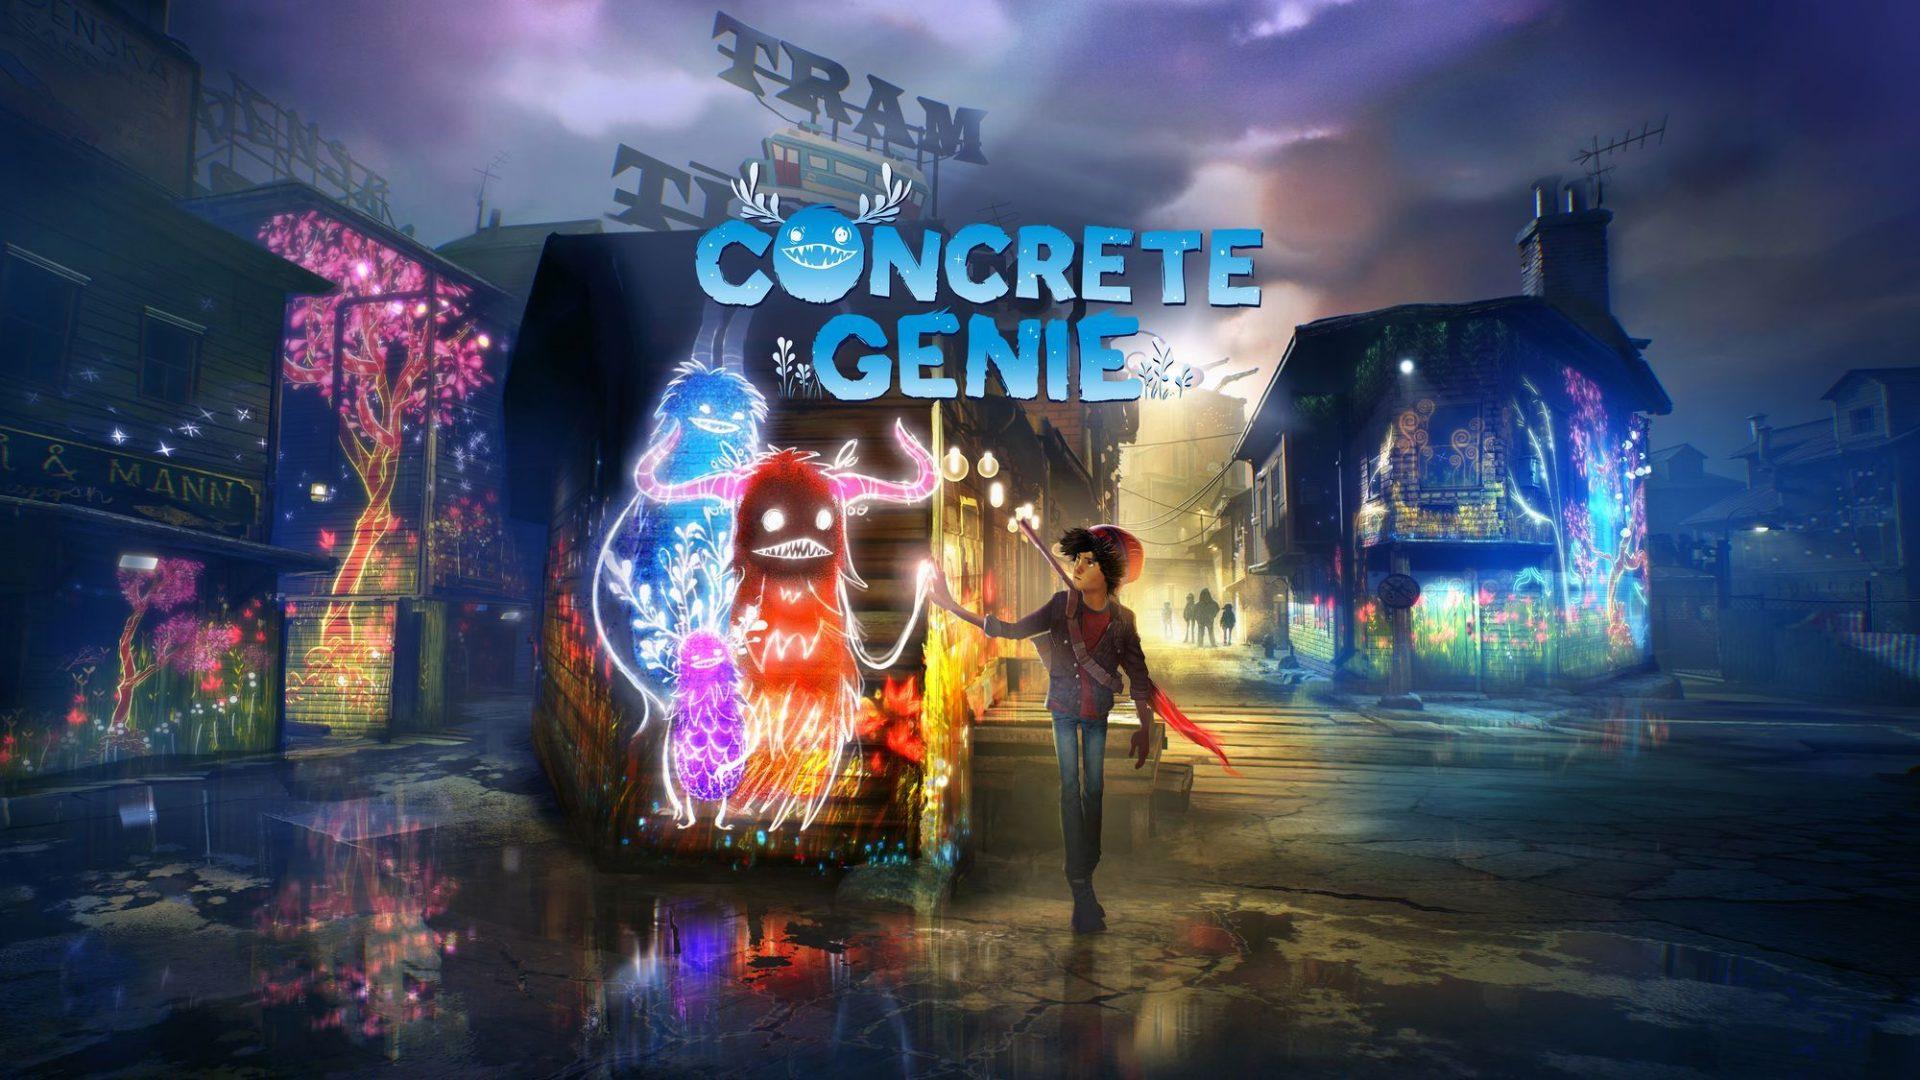 Concrete genie key art 1556720558 5361